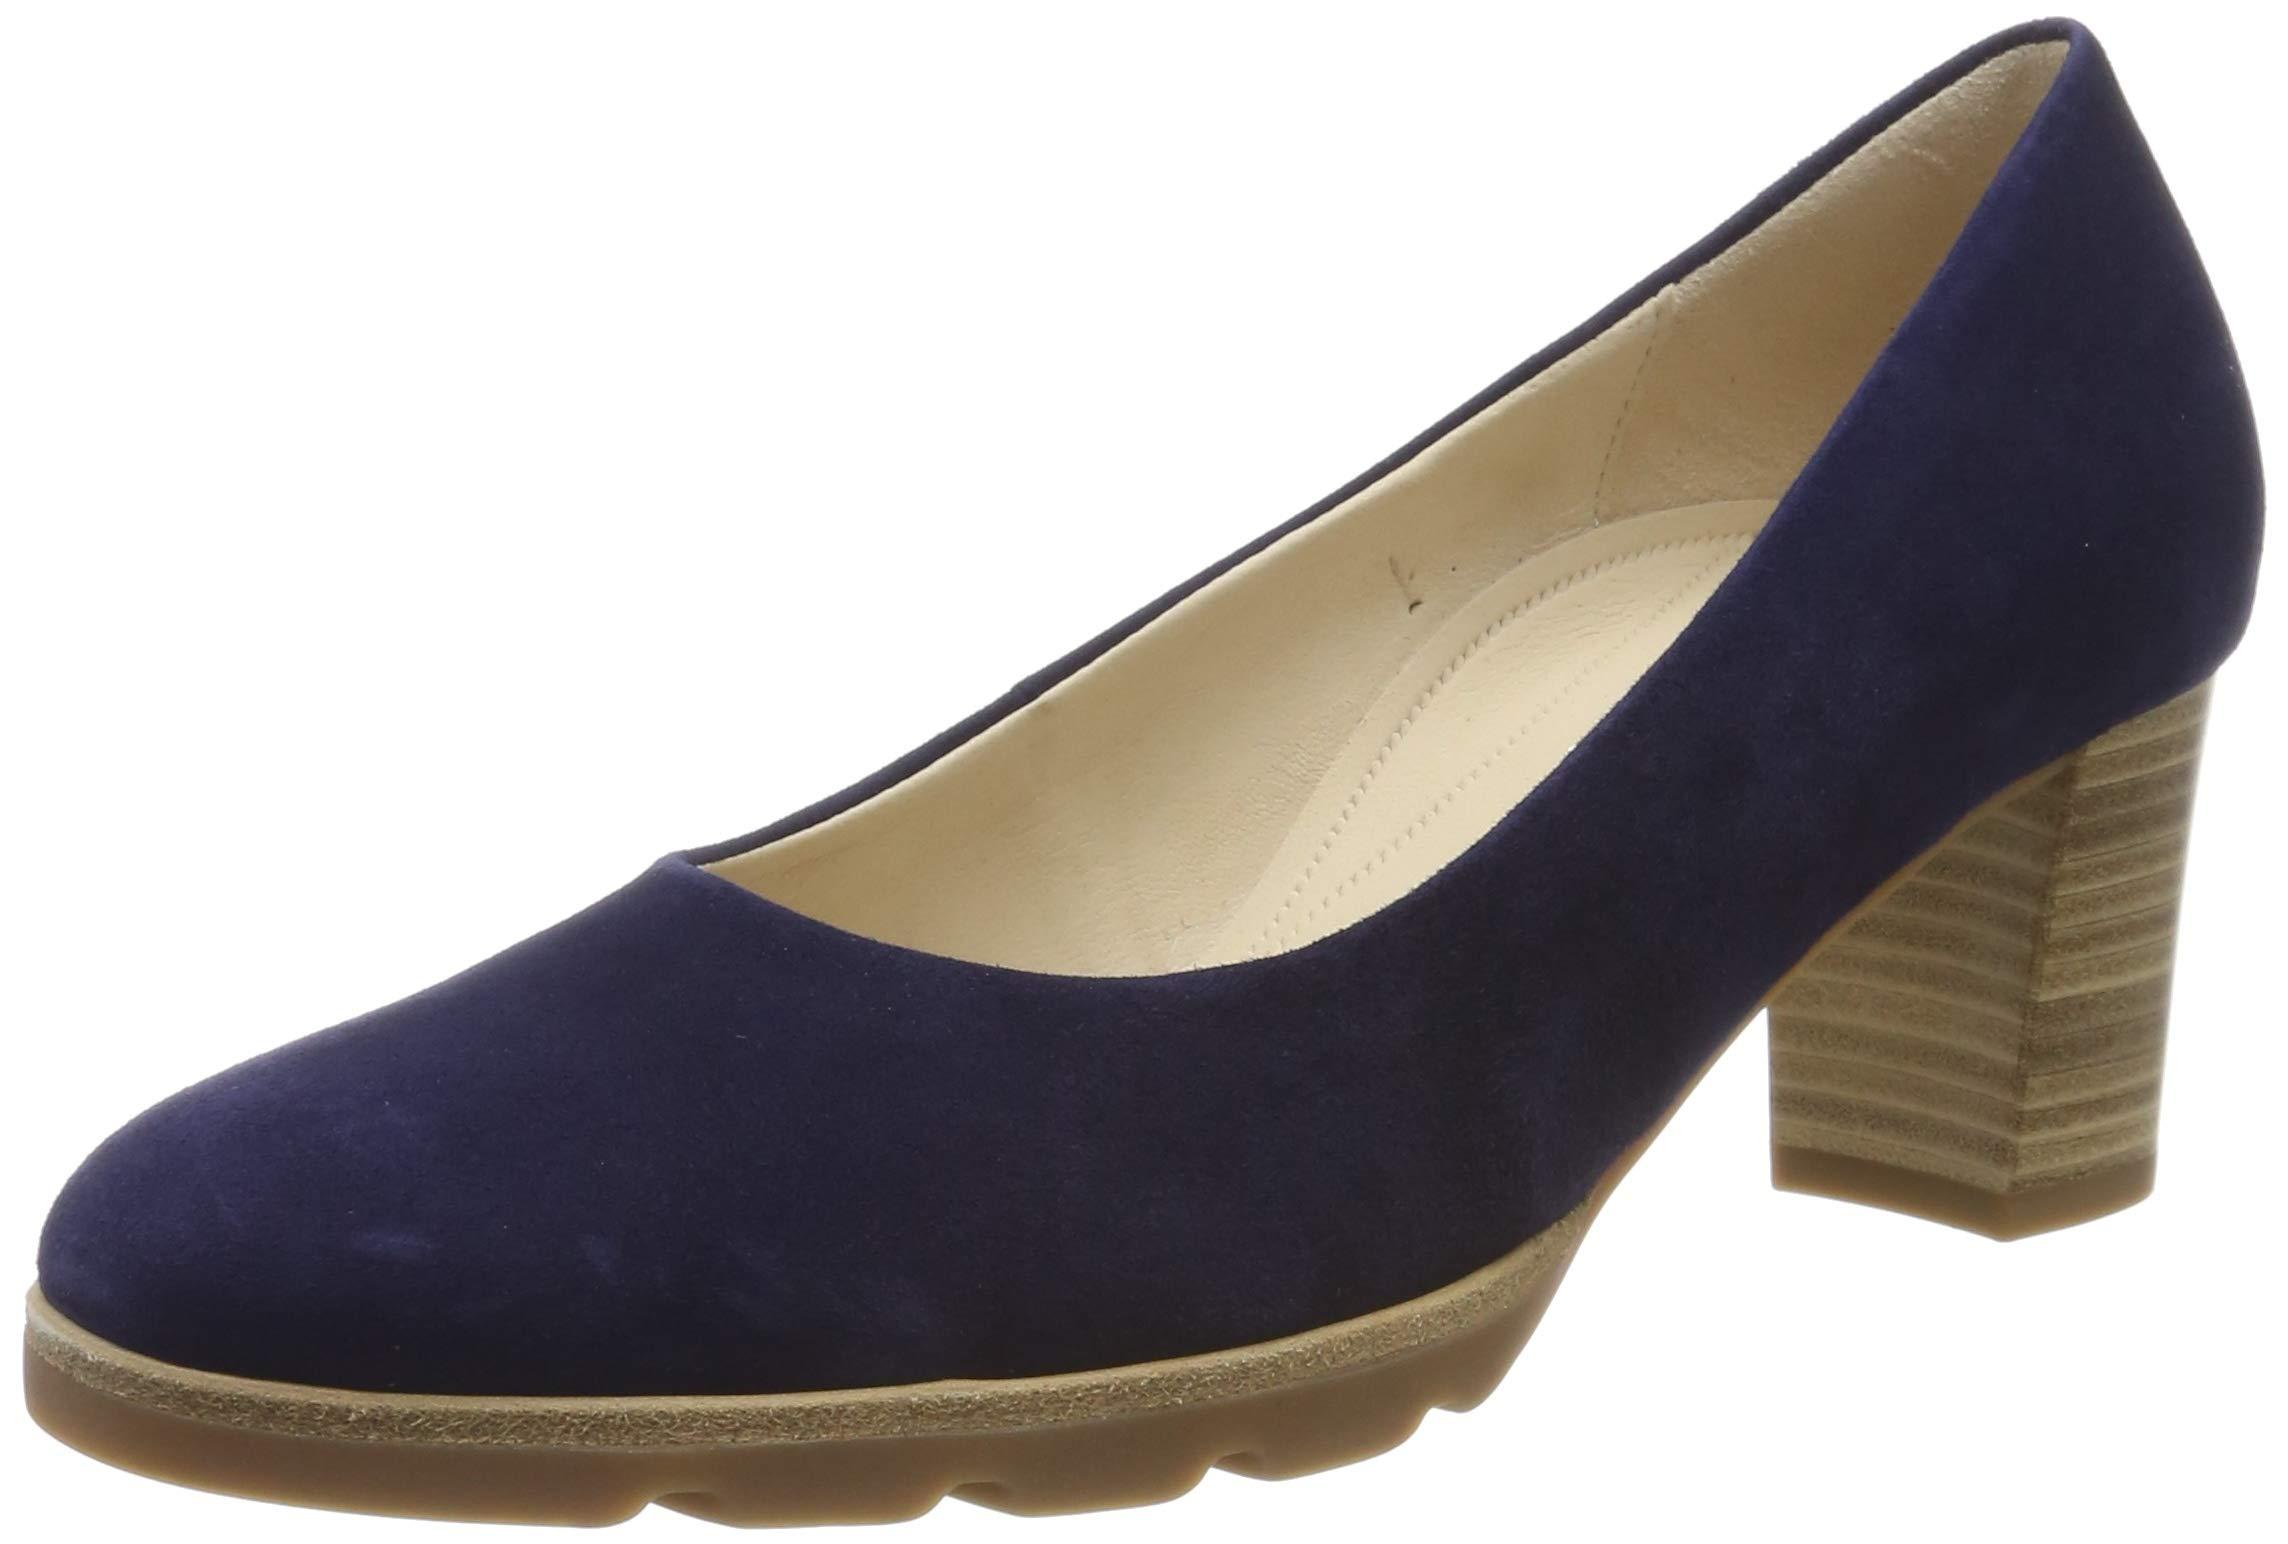 FashionEscarpins 5 Gabor Eu Shoes FemmeBleubluette 3635 Comfort 8wOkn0XP